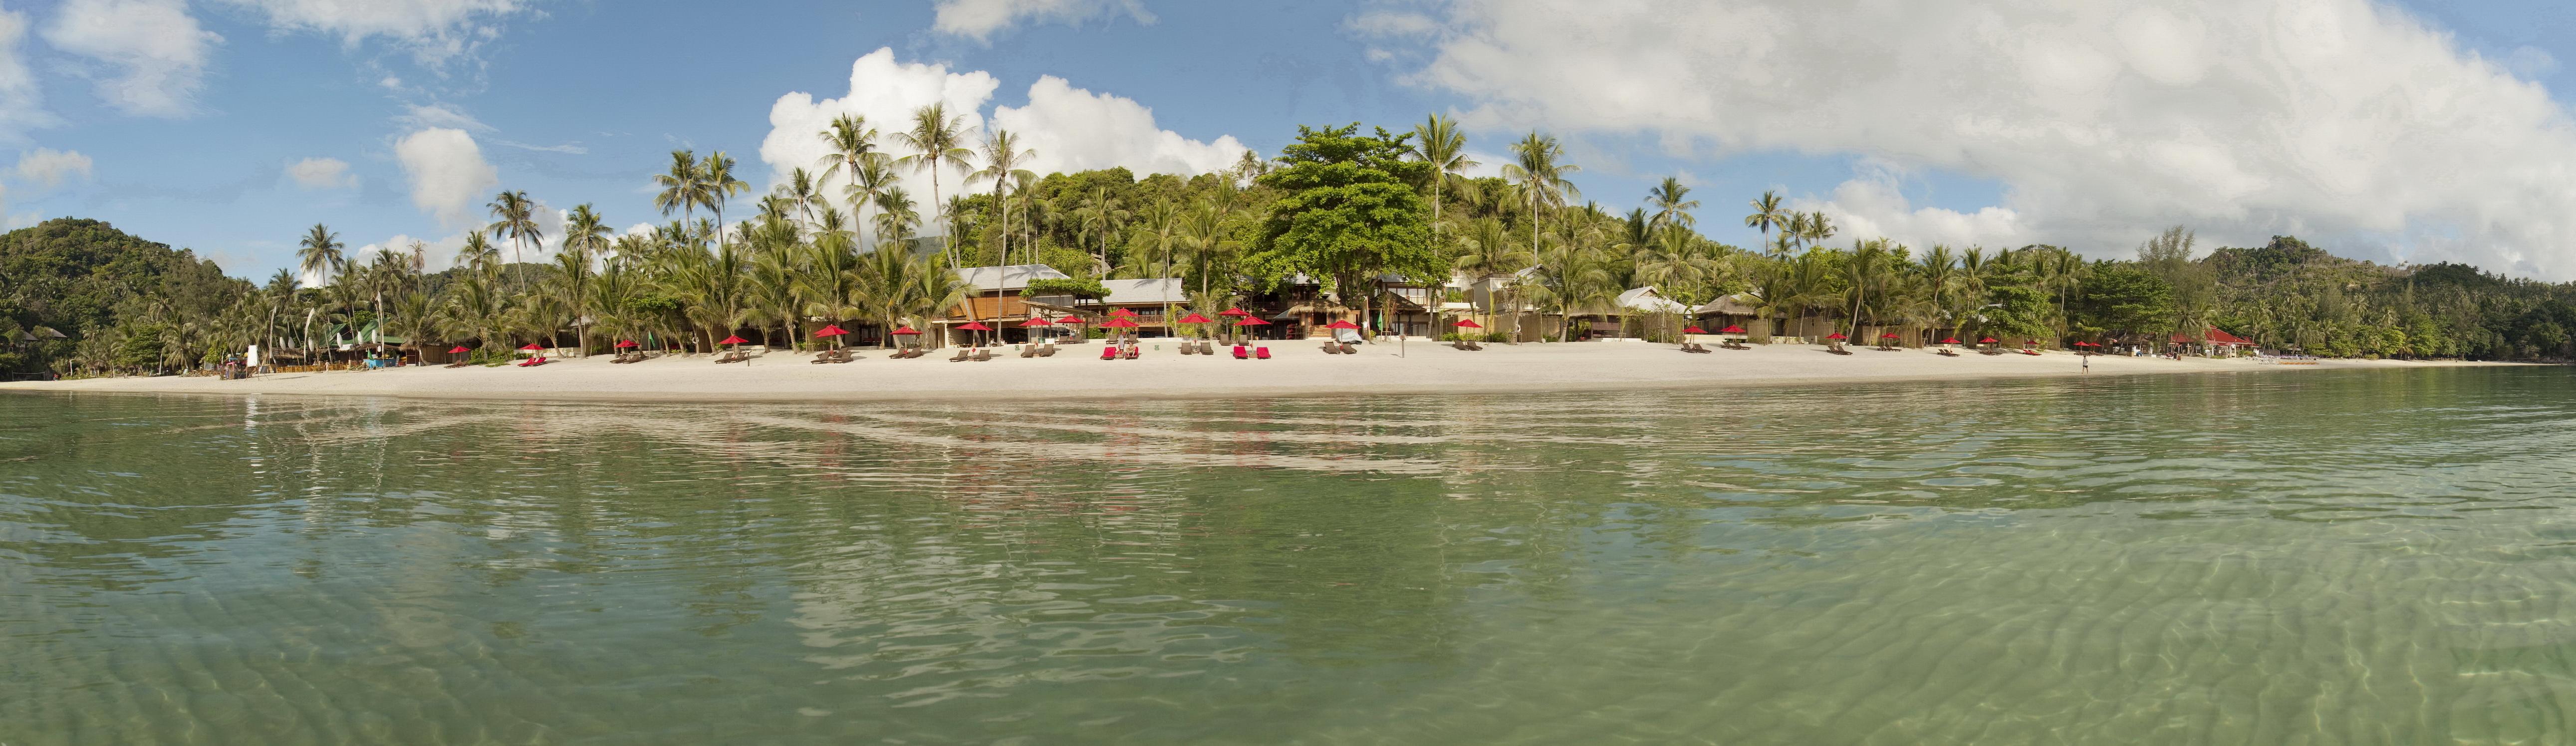 Anantara_Rasananda_island_panorama